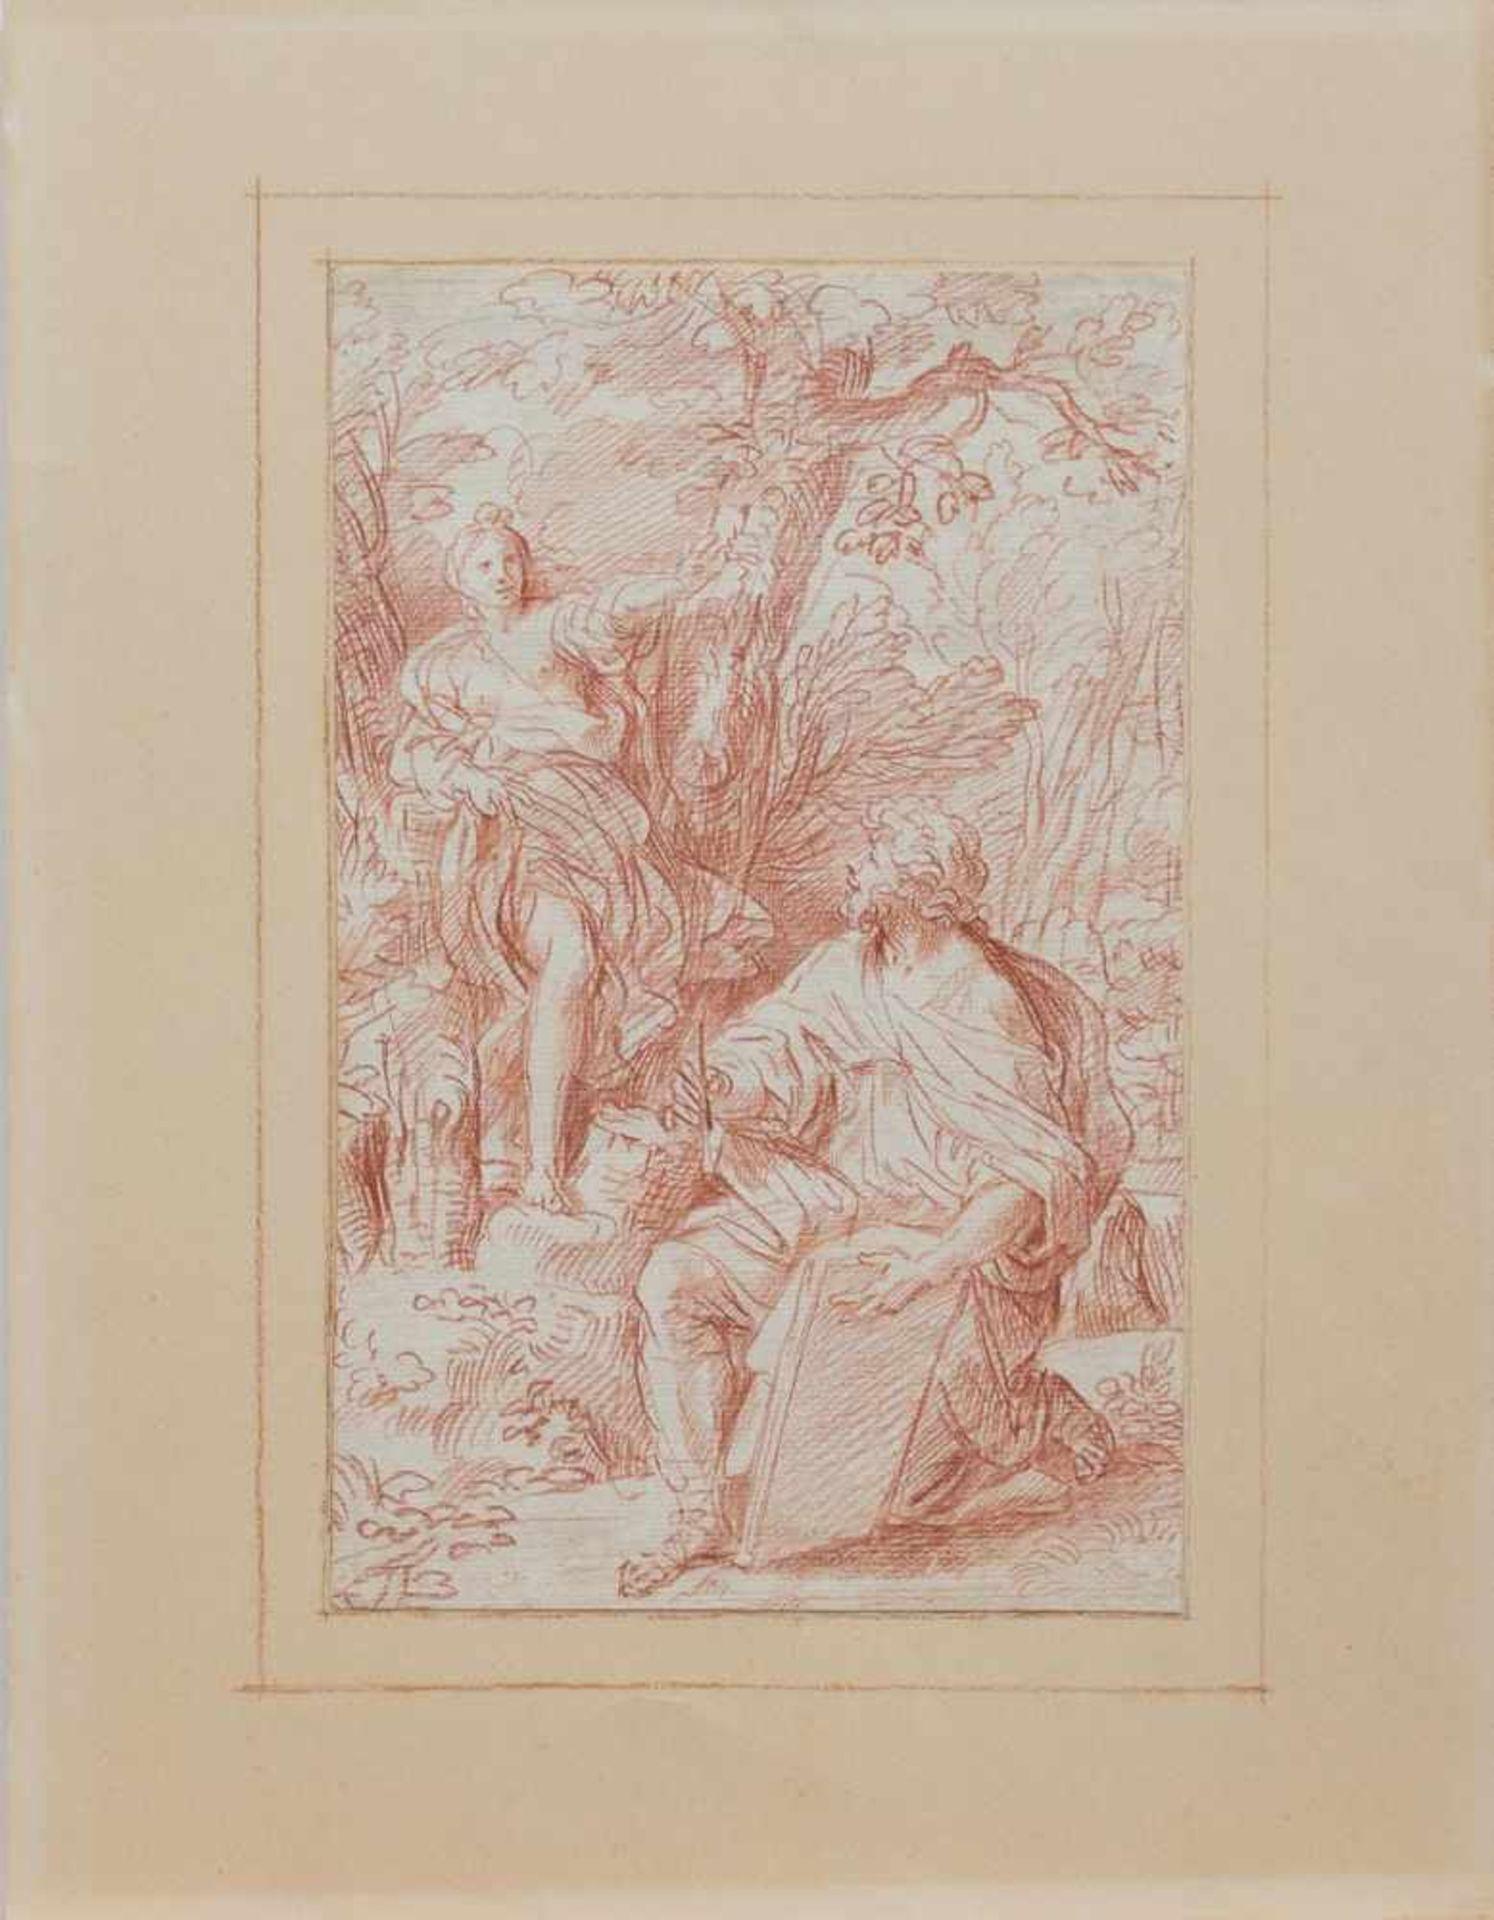 Los 42 - Christian Bernhard Rode (Berlin 1725 - 1797 ebenda, Berliner Historienmaler in der zweiten Hälfte